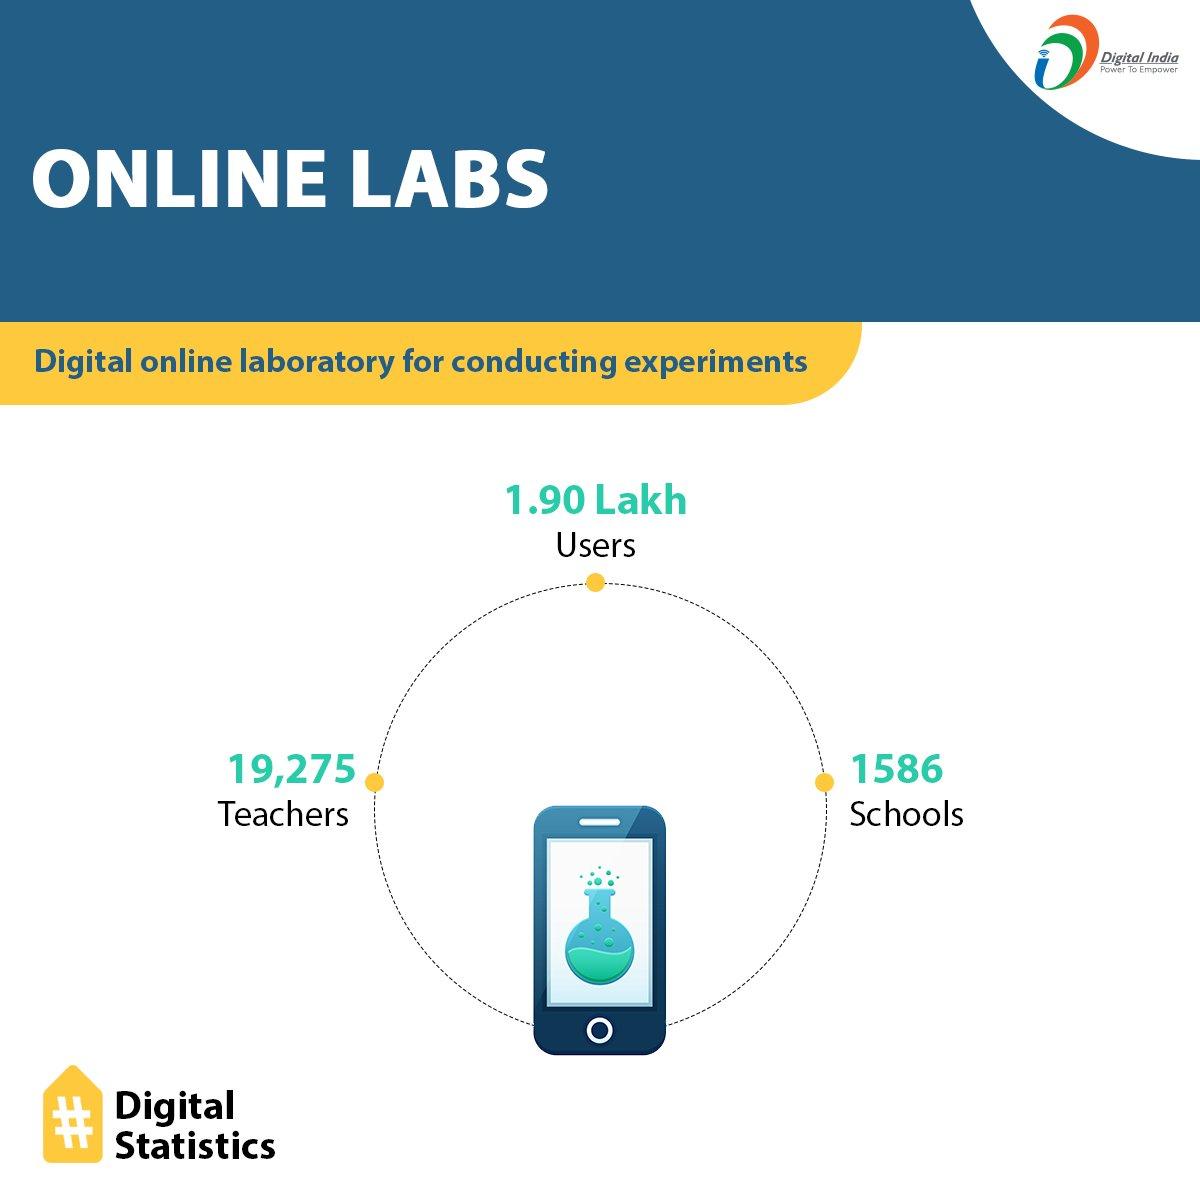 Digital India on Twitter: